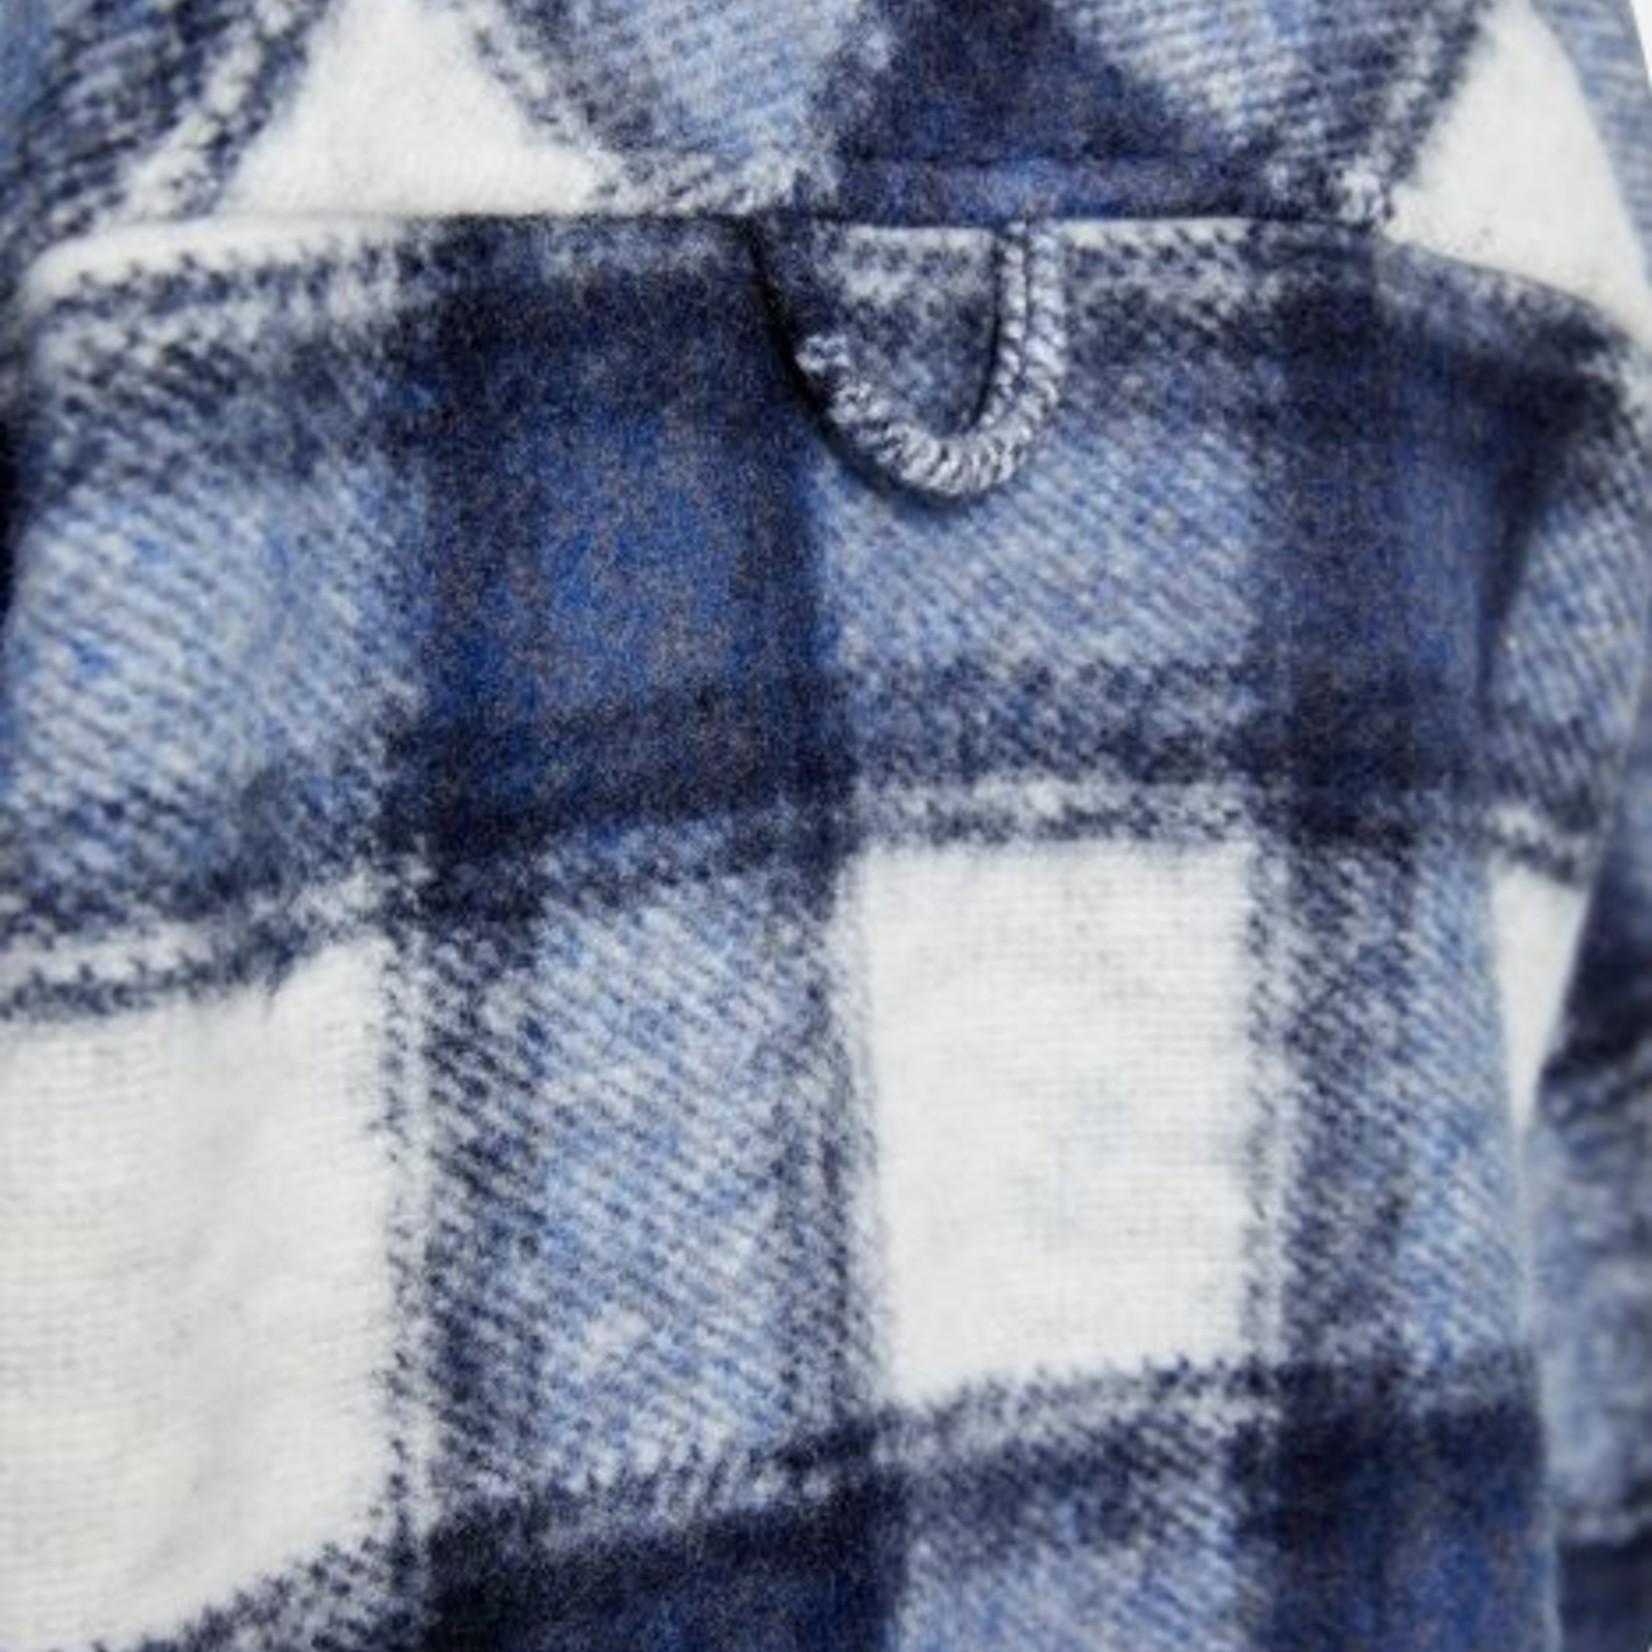 SMITH & SOUL CHECKS JACKET, over blouse